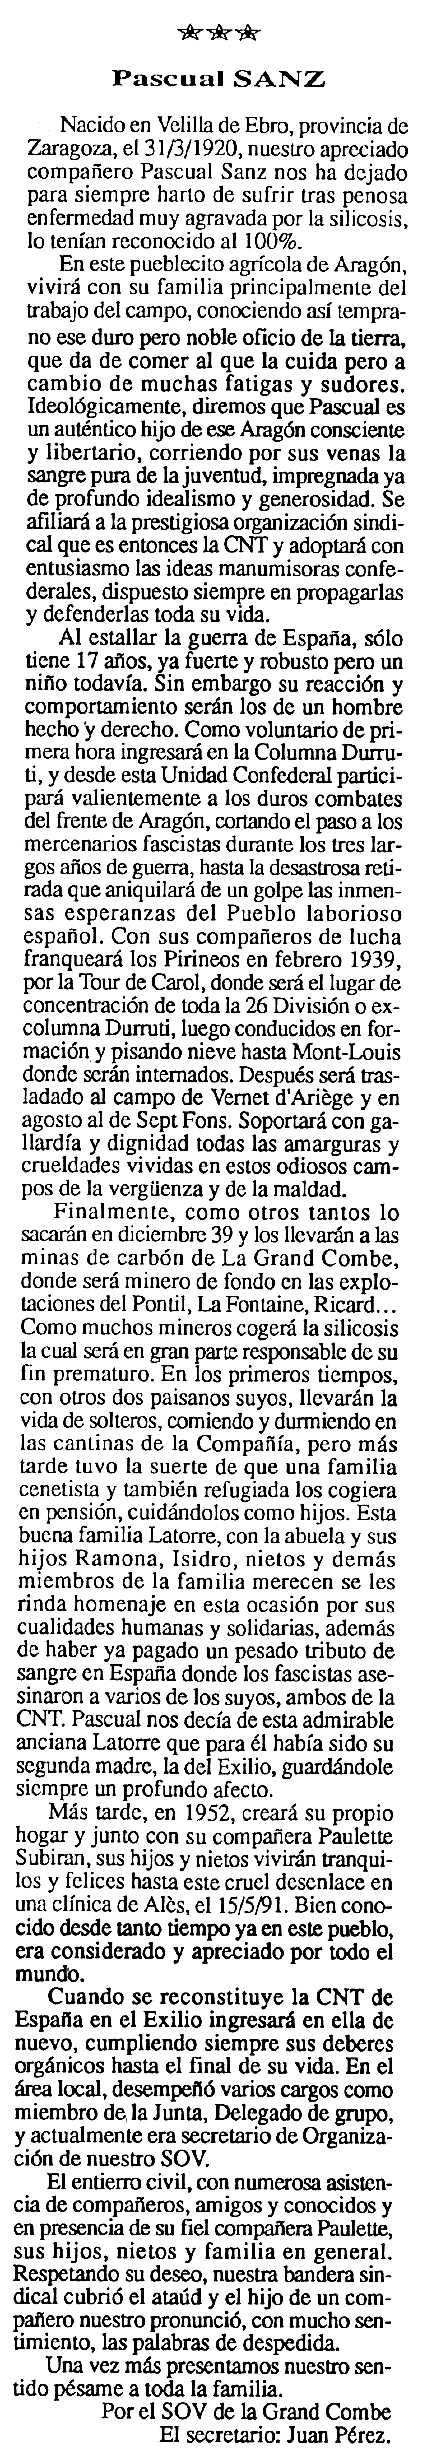 "Necrològica de Pascual Sanz Lambea apareguda en el periòdic tolosà ""Cenit"" del 3 de setembre de 1991"